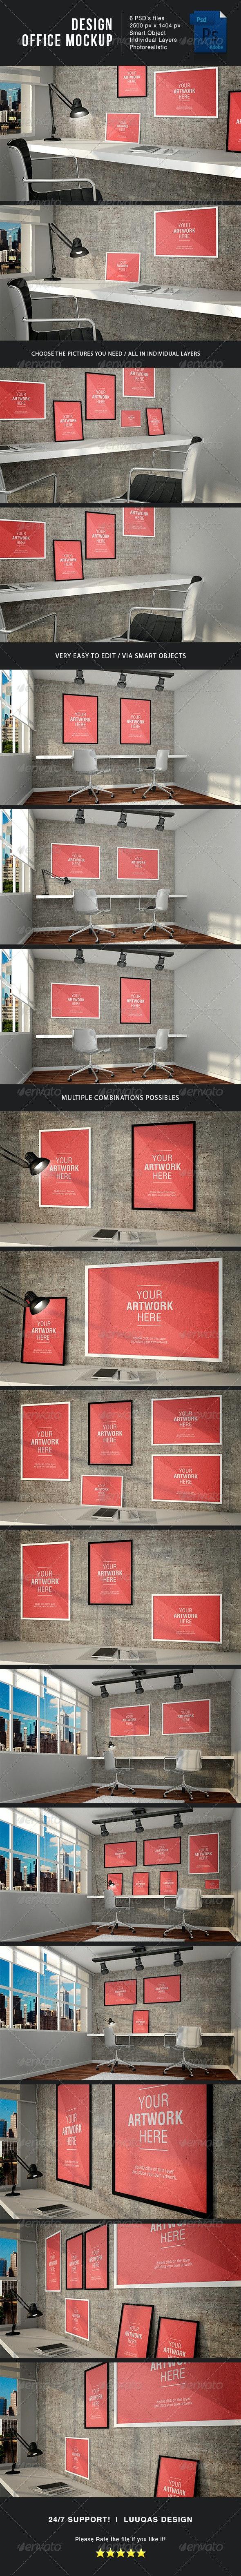 Design Office MockUp - Posters Print